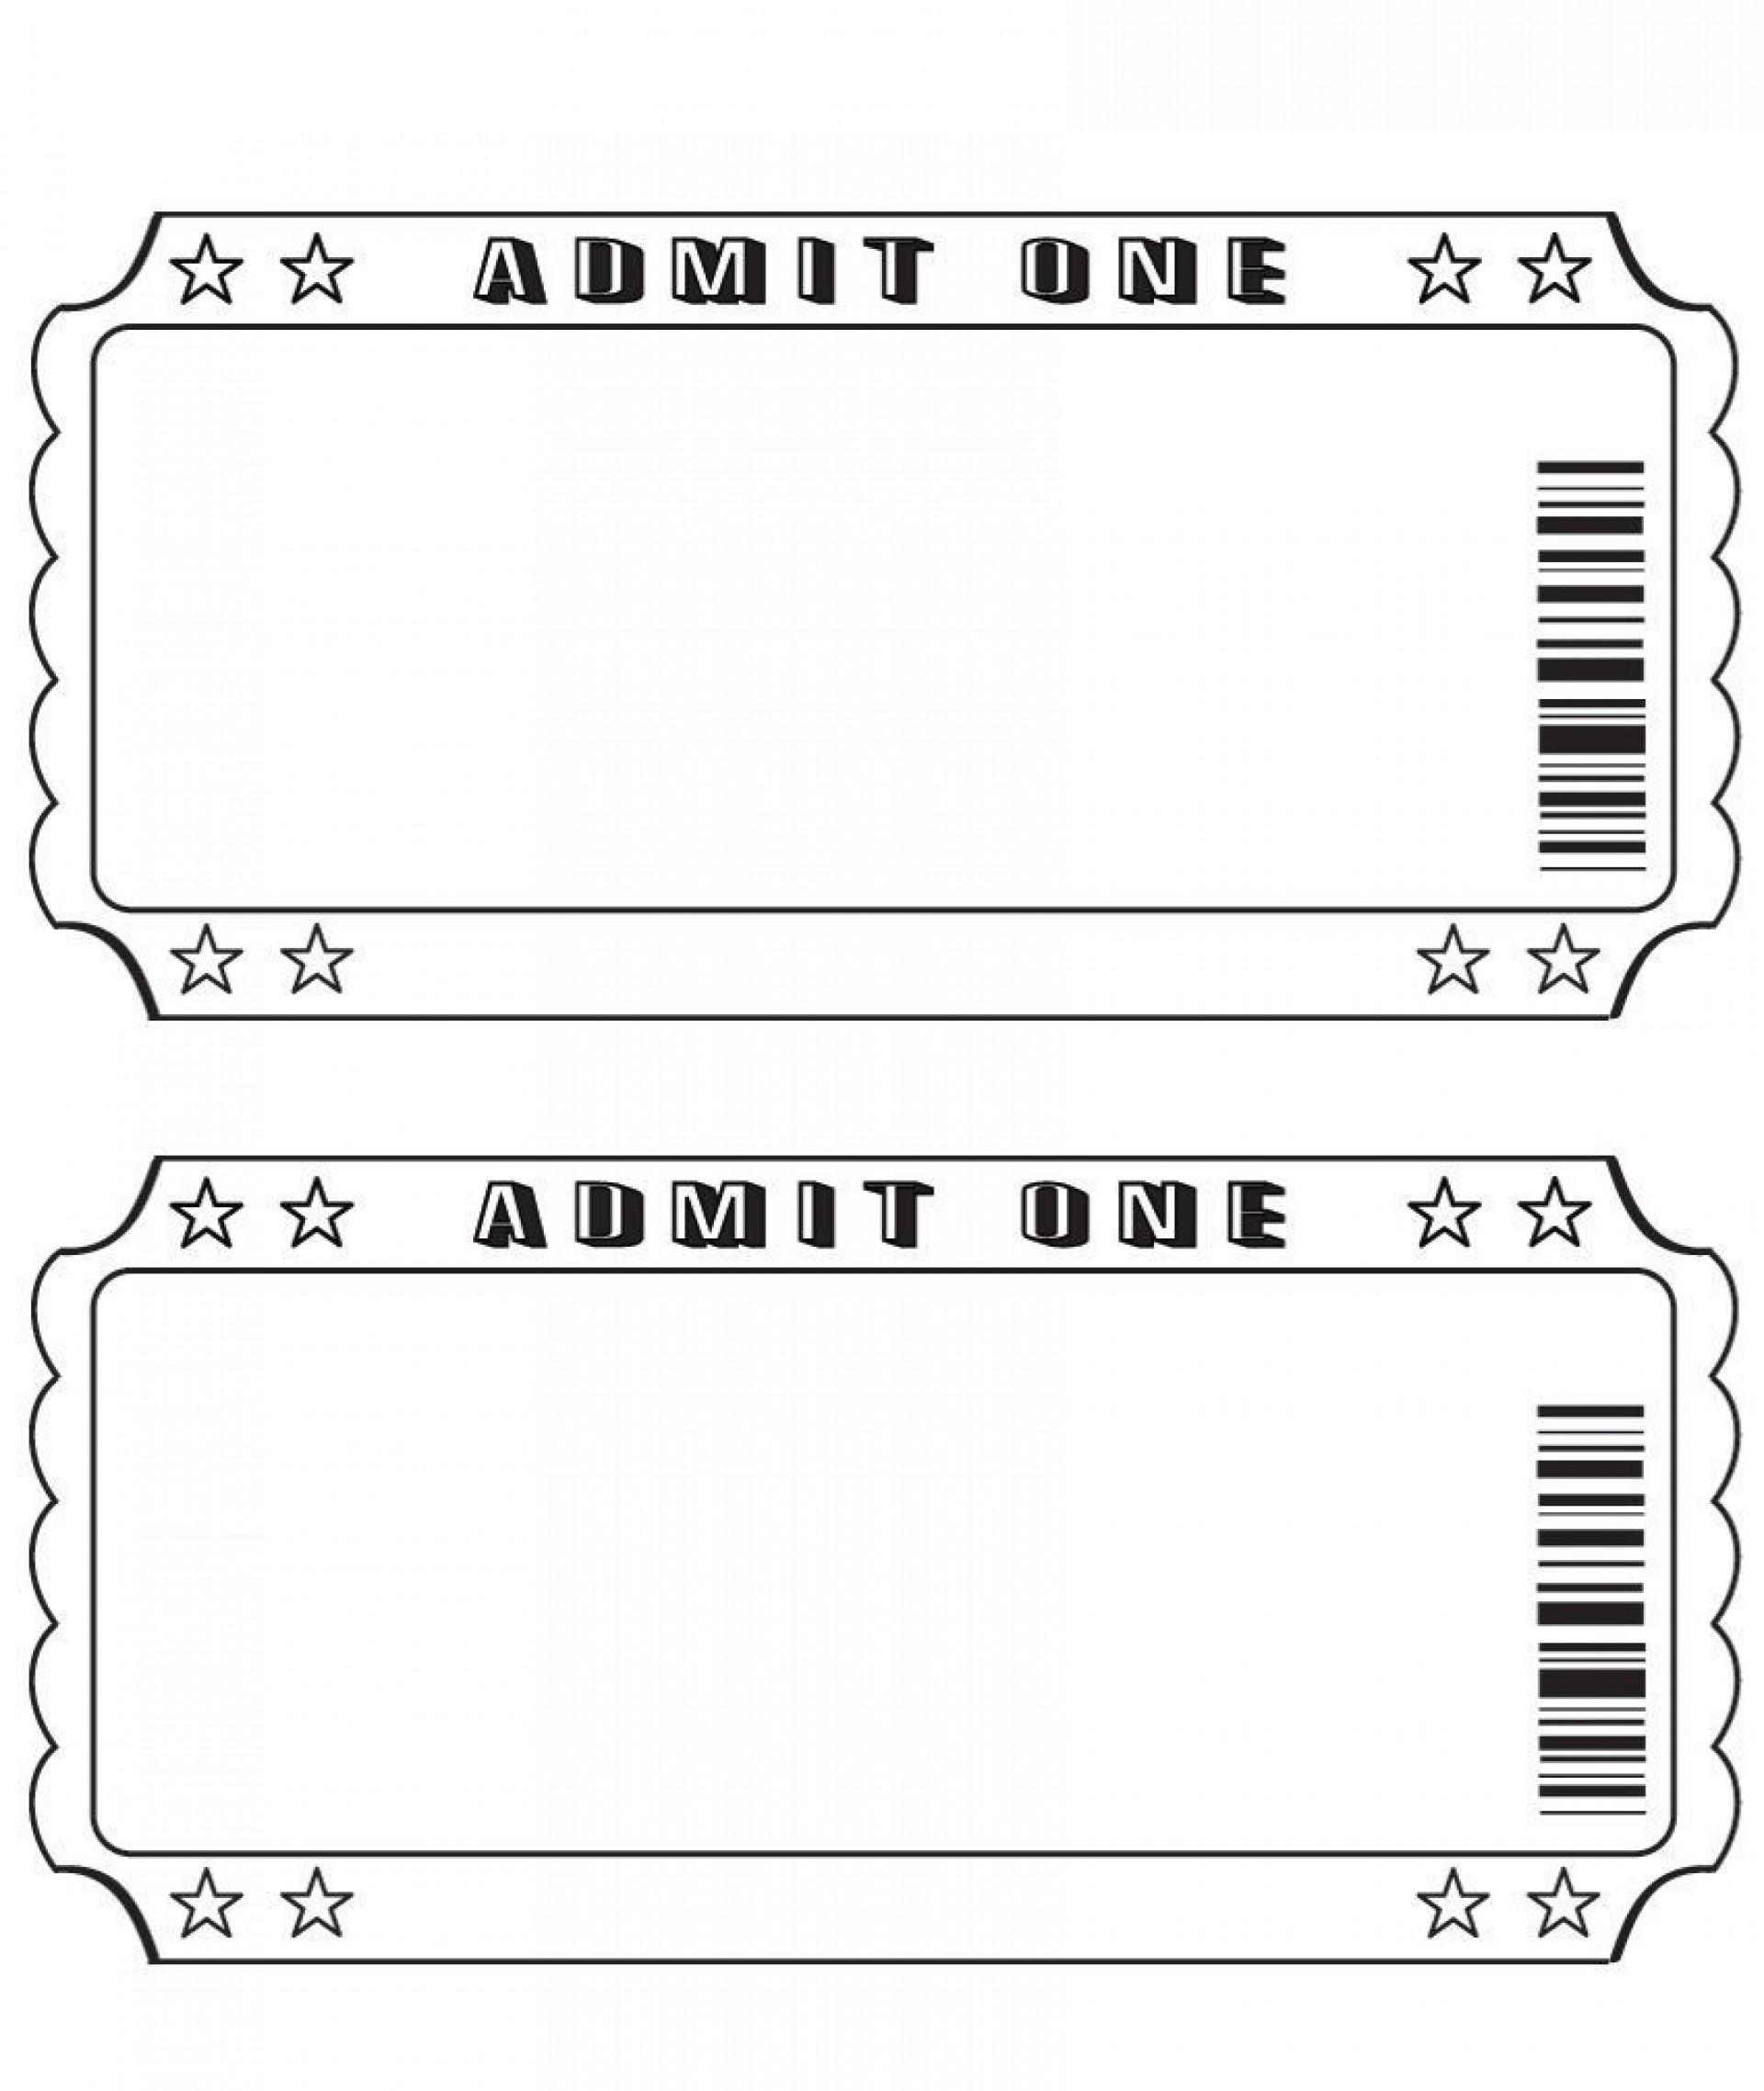 003 Impressive Free Concert Ticket Maker Template High Definition  Printable Gift1920